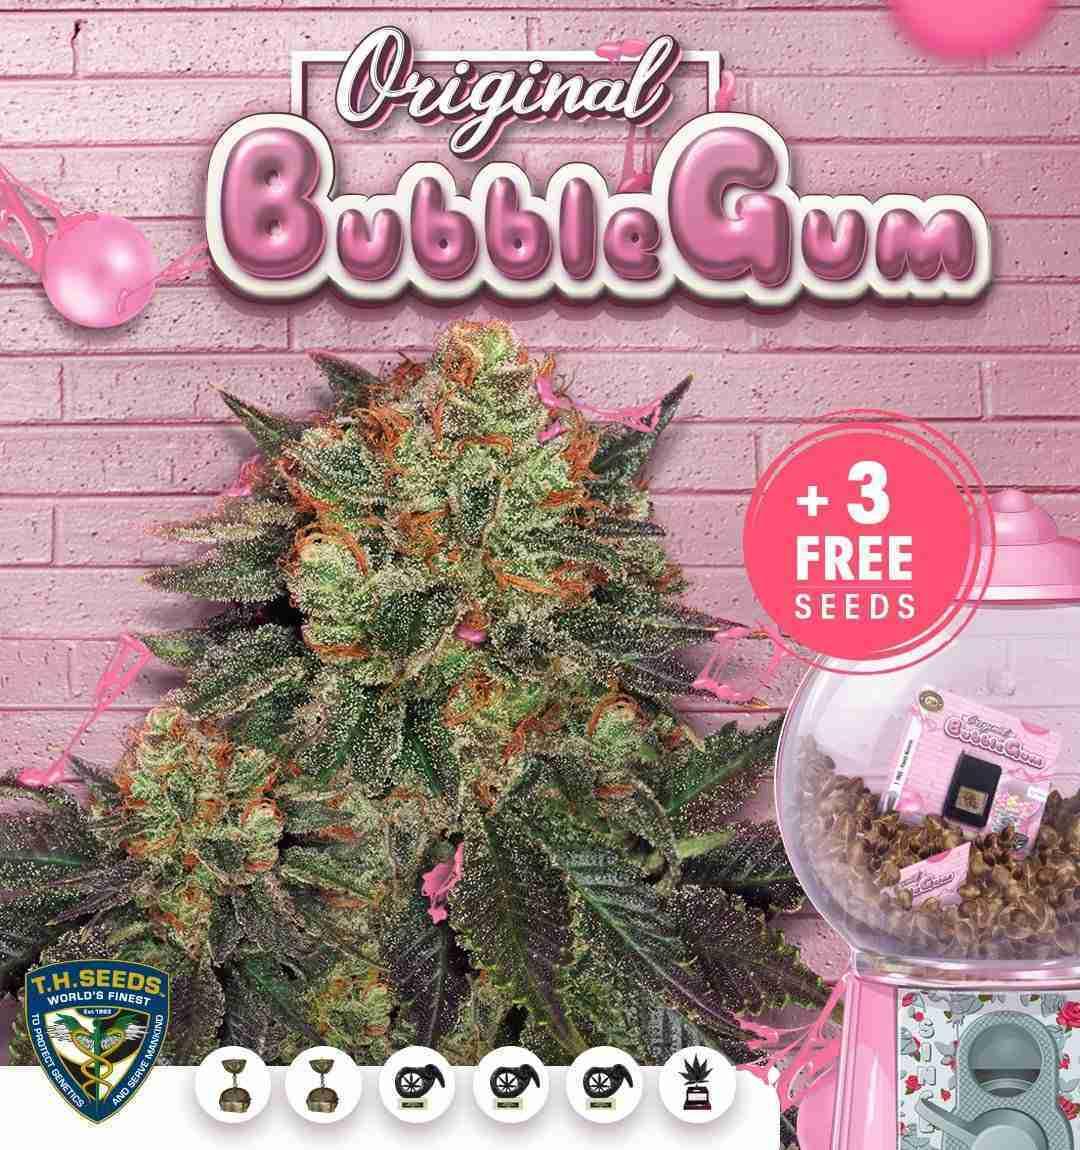 bubblegum-710-special-advert4